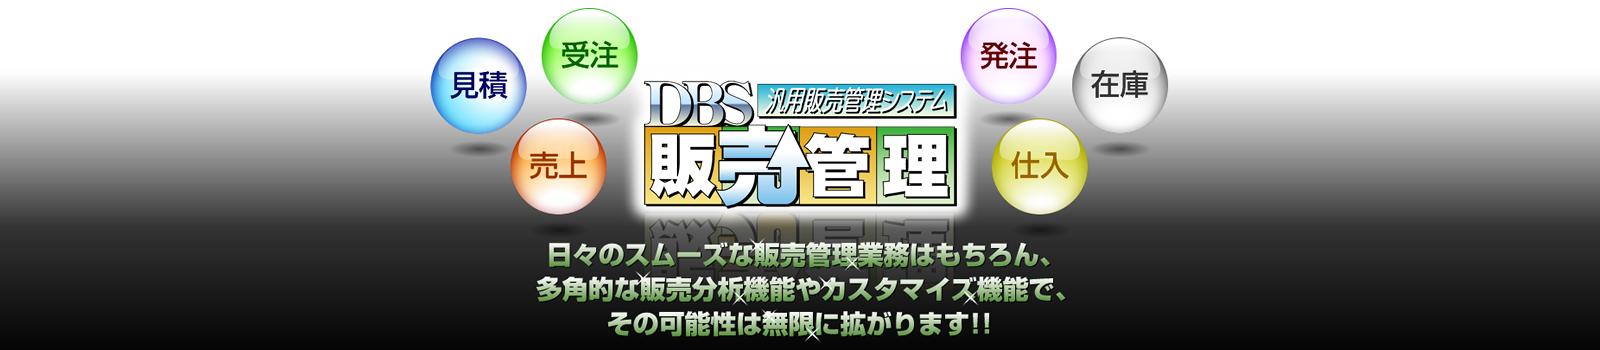 DBS販売管理